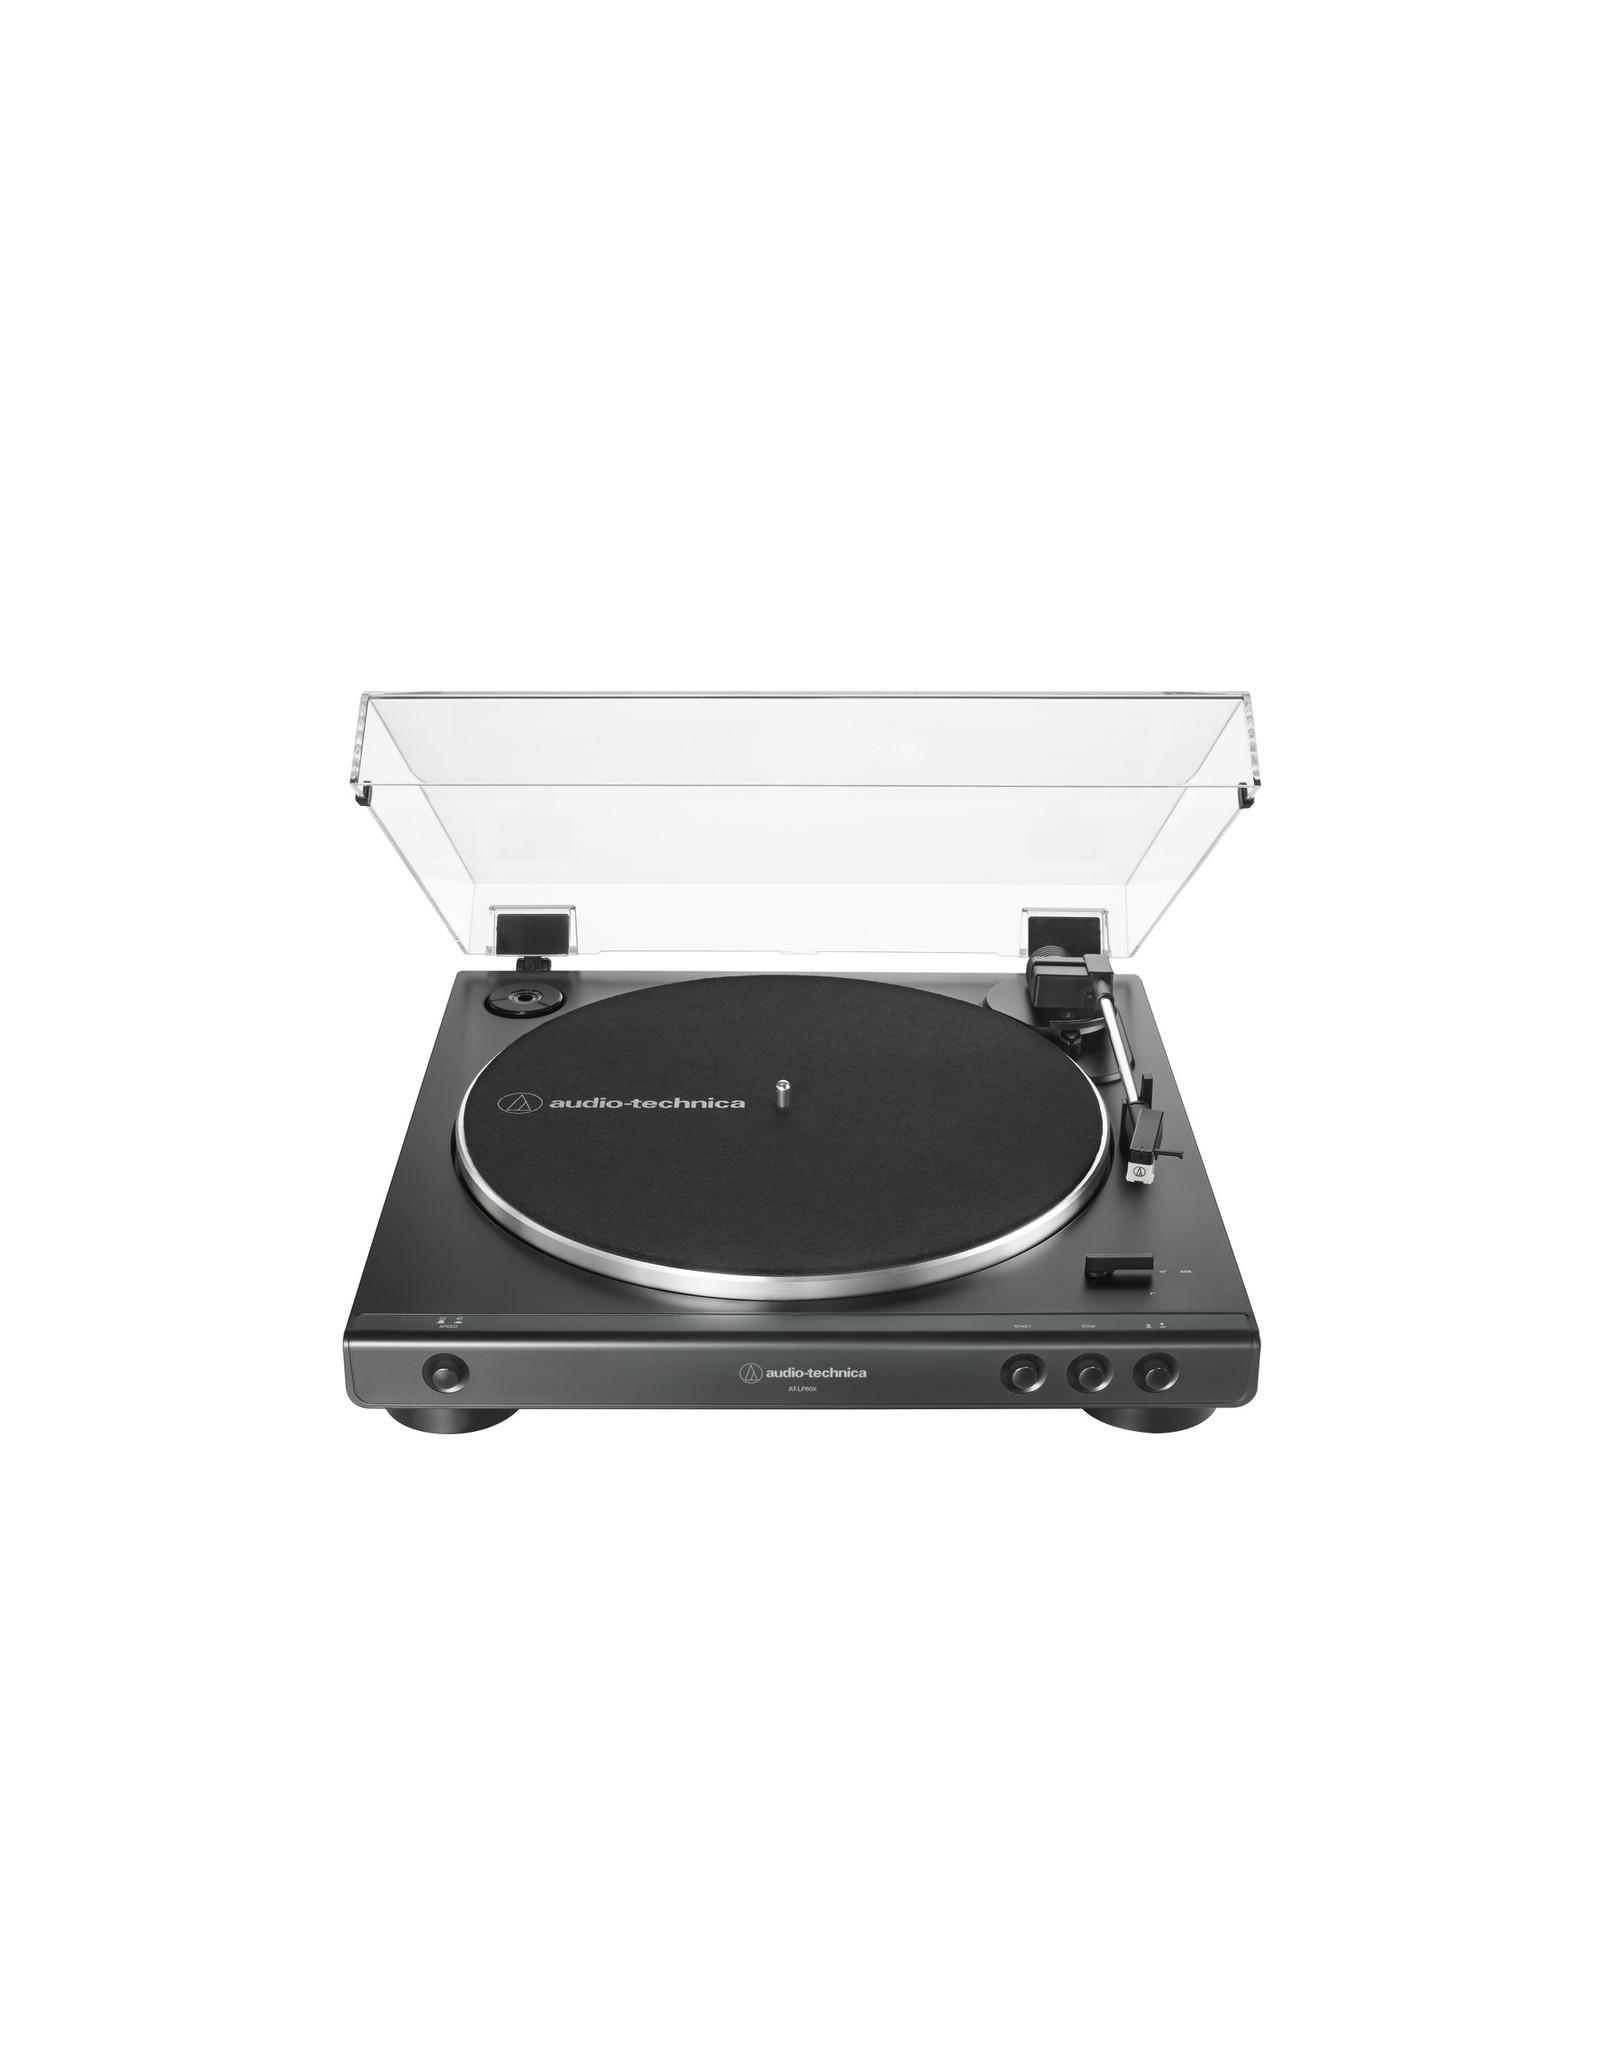 Audio-Technica Audio-Technica AT-LP60X Turntable